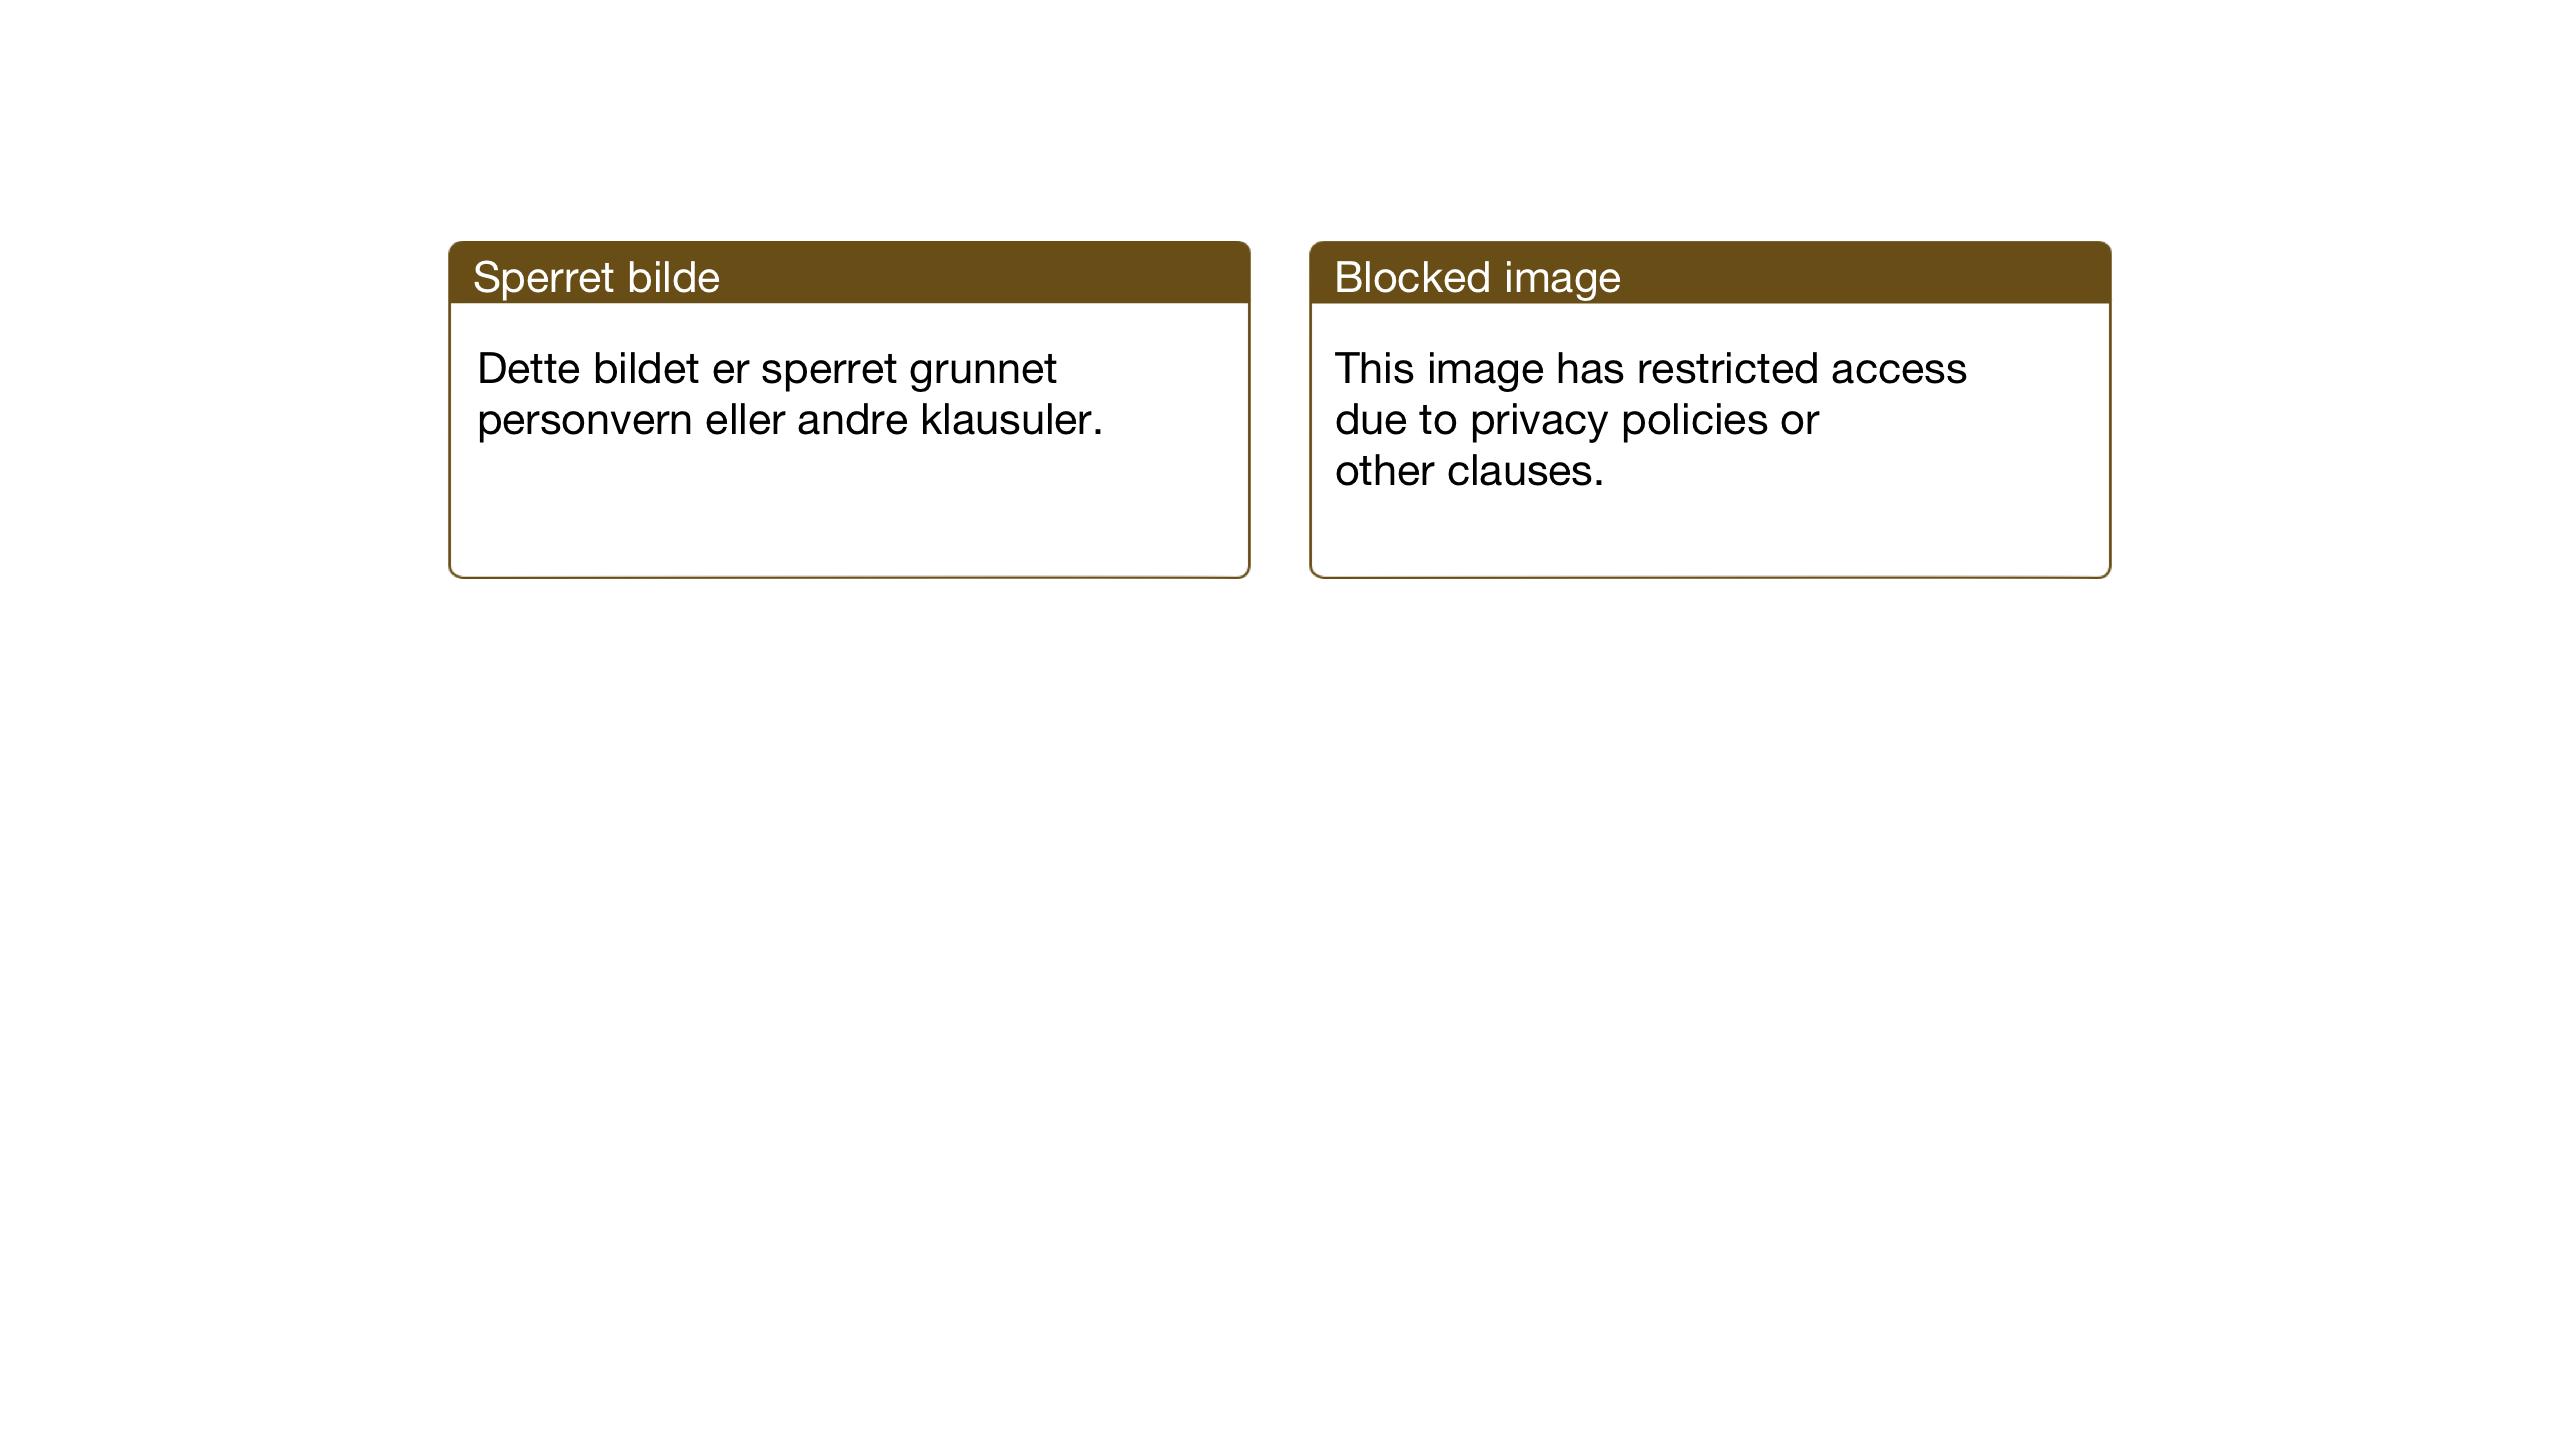 SAB, Domkirken Sokneprestembete, H/Haa: Ministerialbok nr. C 9, 1958-2001, s. 52b-53a